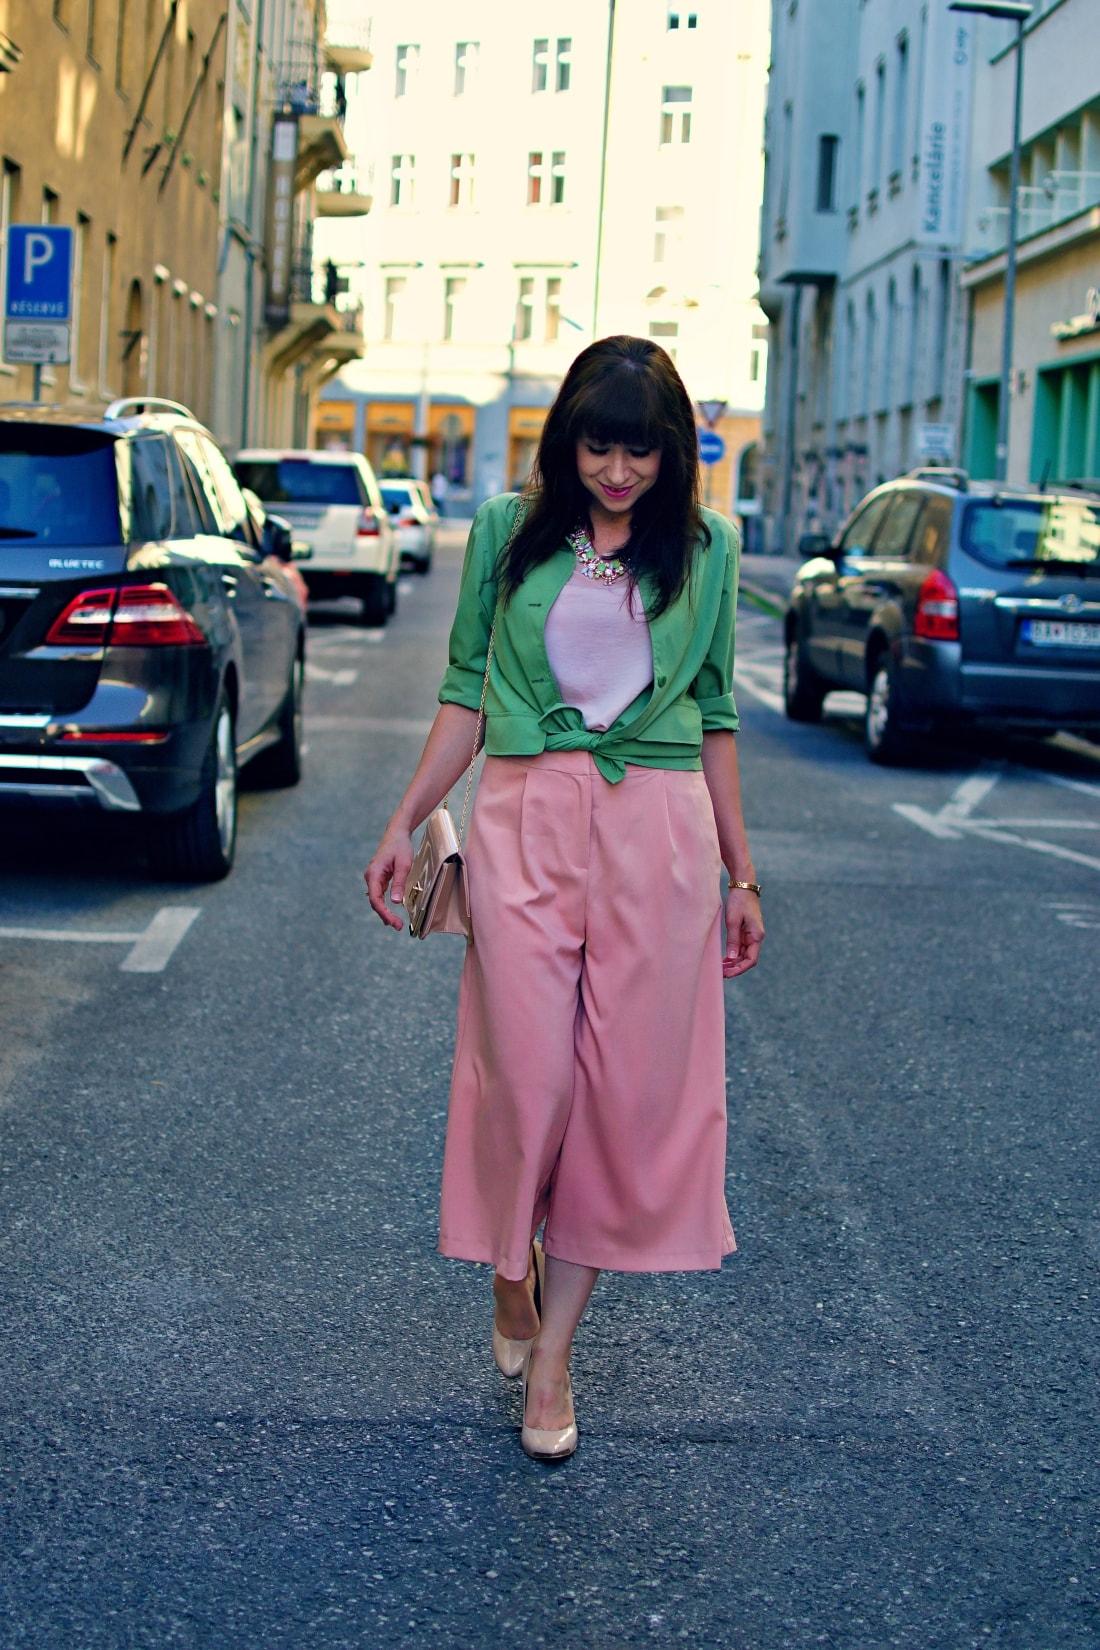 Culottes_Katharine-fashion is beautiful blog 4_Ružové nohavice_Nude lodičky_Katarína Jakubčová